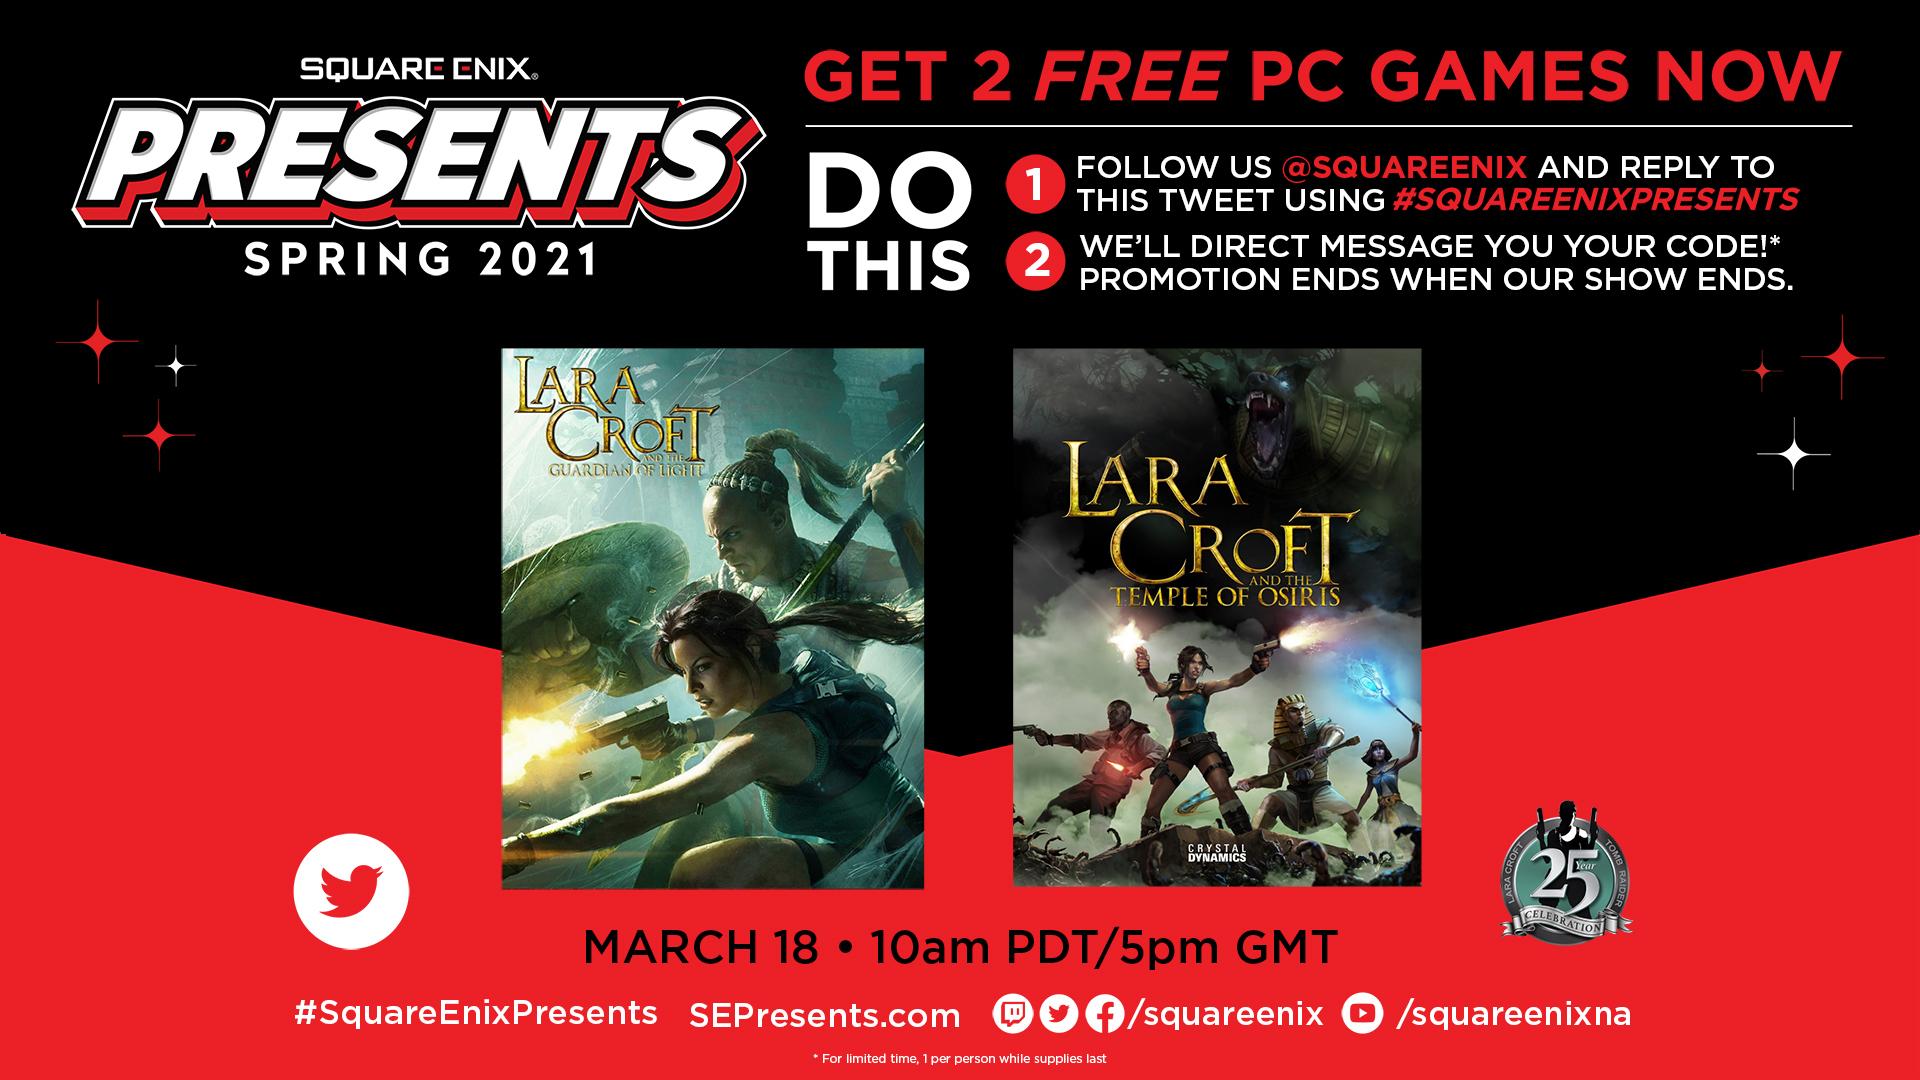 Lara Croft and the Guardian of Light + Lara Croft and the Temple of Osiris kostenlos für Antwort & Follow auf Twitter [Steam]